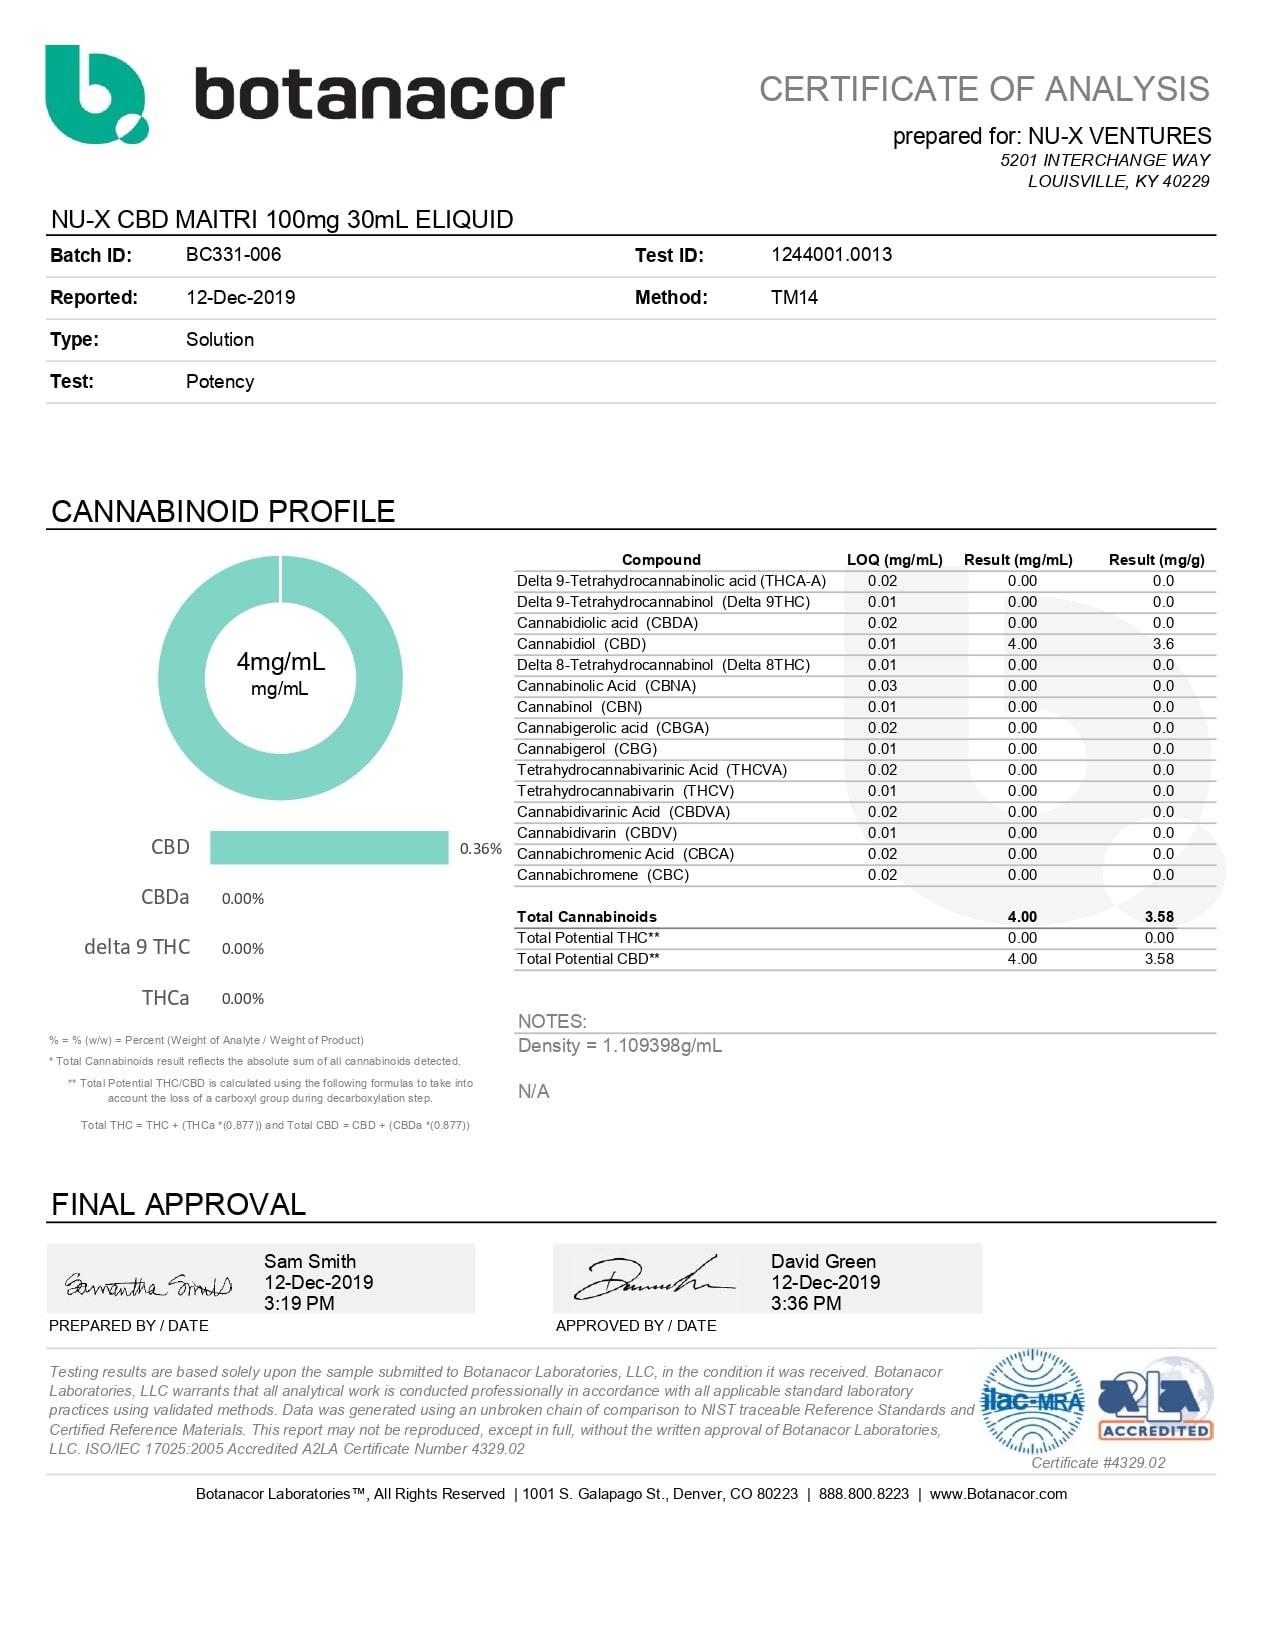 NU-X CBD eLiquid Mango Lychee - Maitri Lab Report 100mg